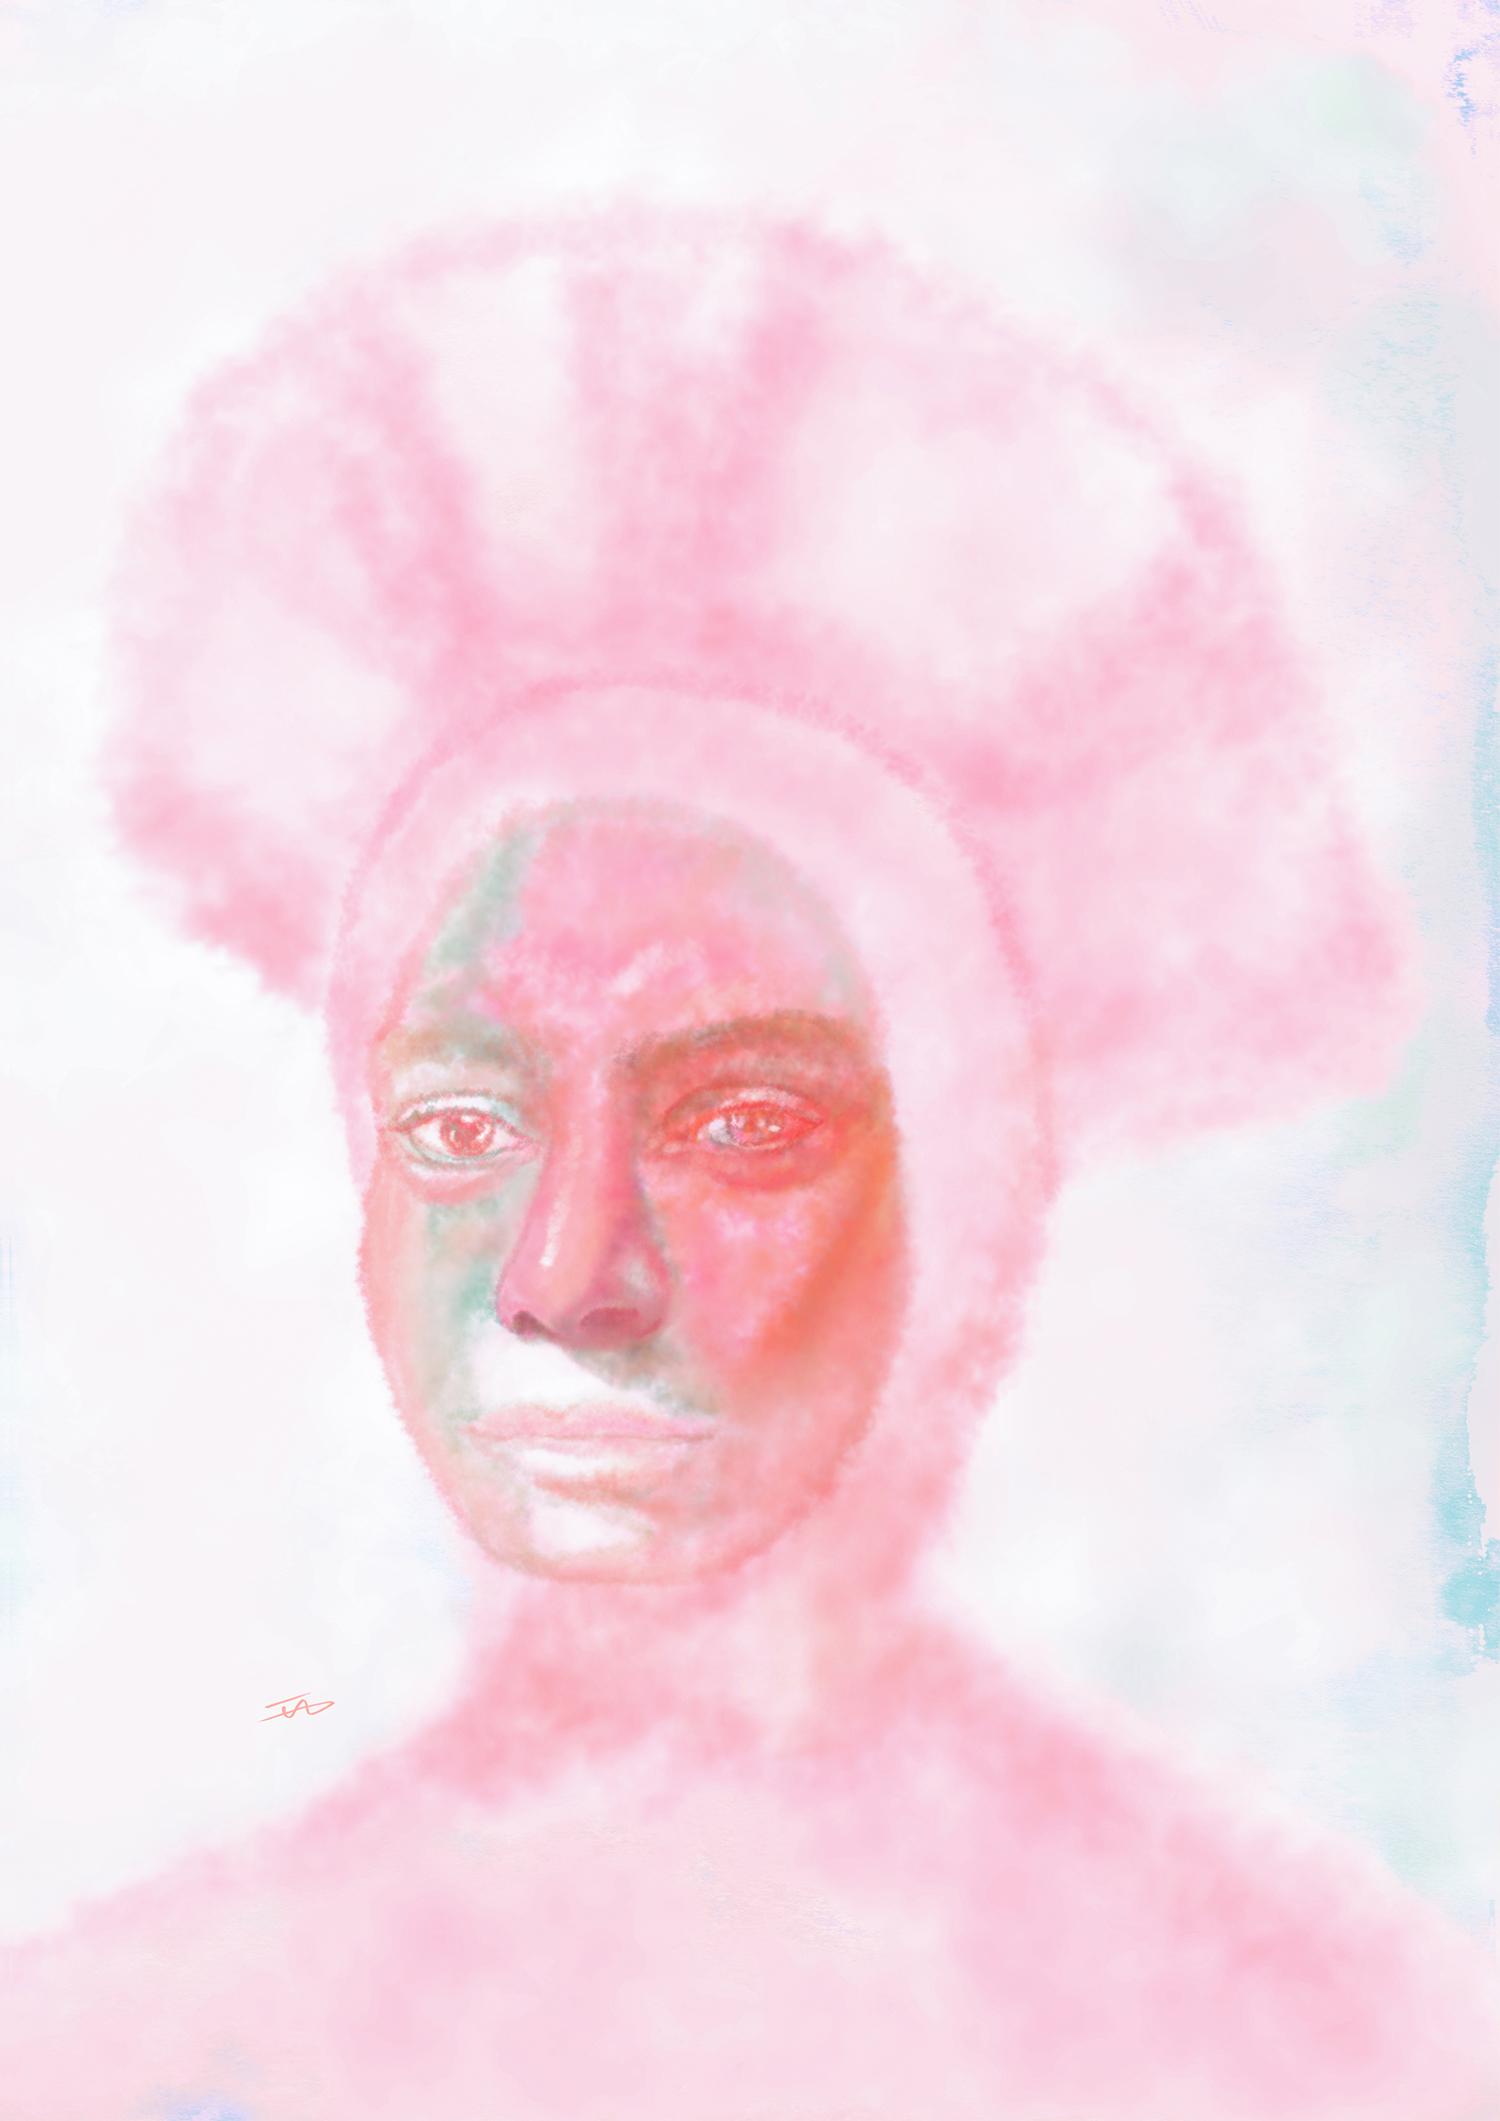 Mariiiiii, 2018, Digital art printed on inkjet paper, A3, available at  www.society6.com/islamallam